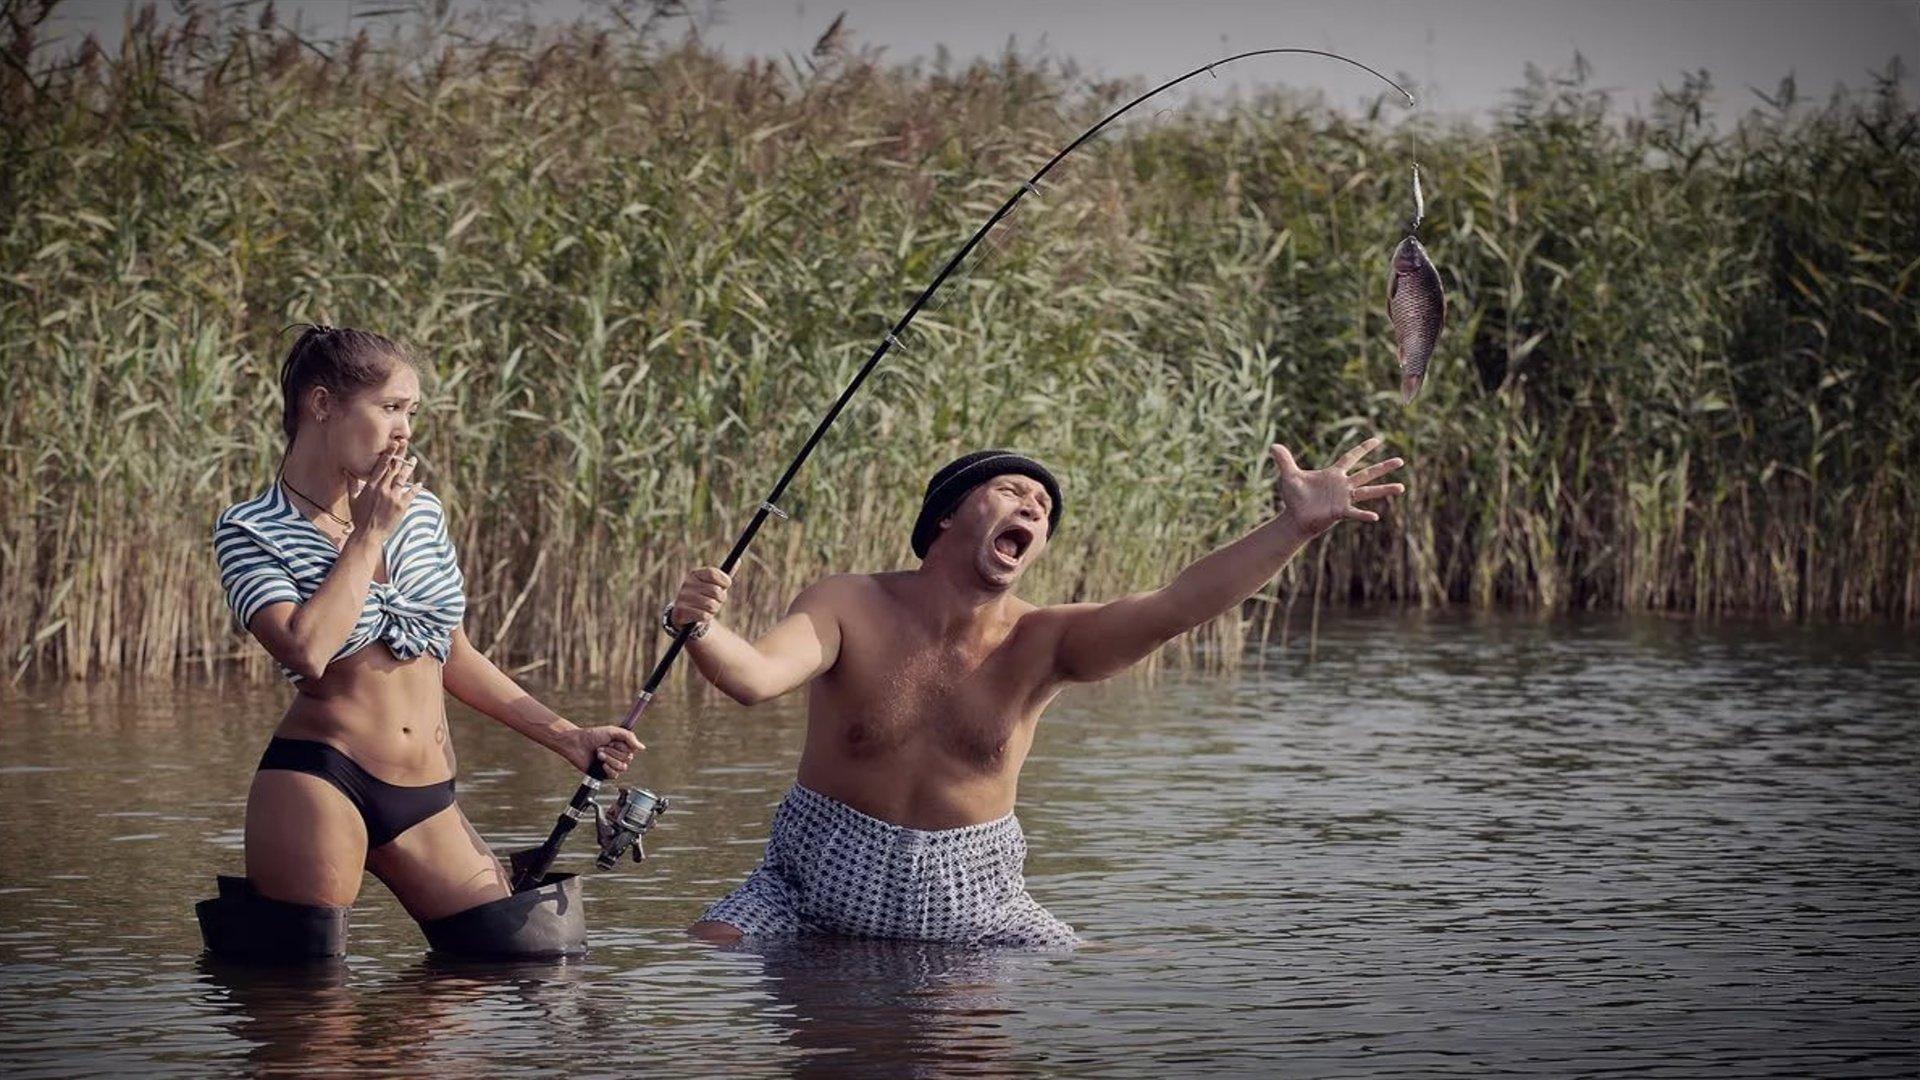 Картинка вова на рыбалке